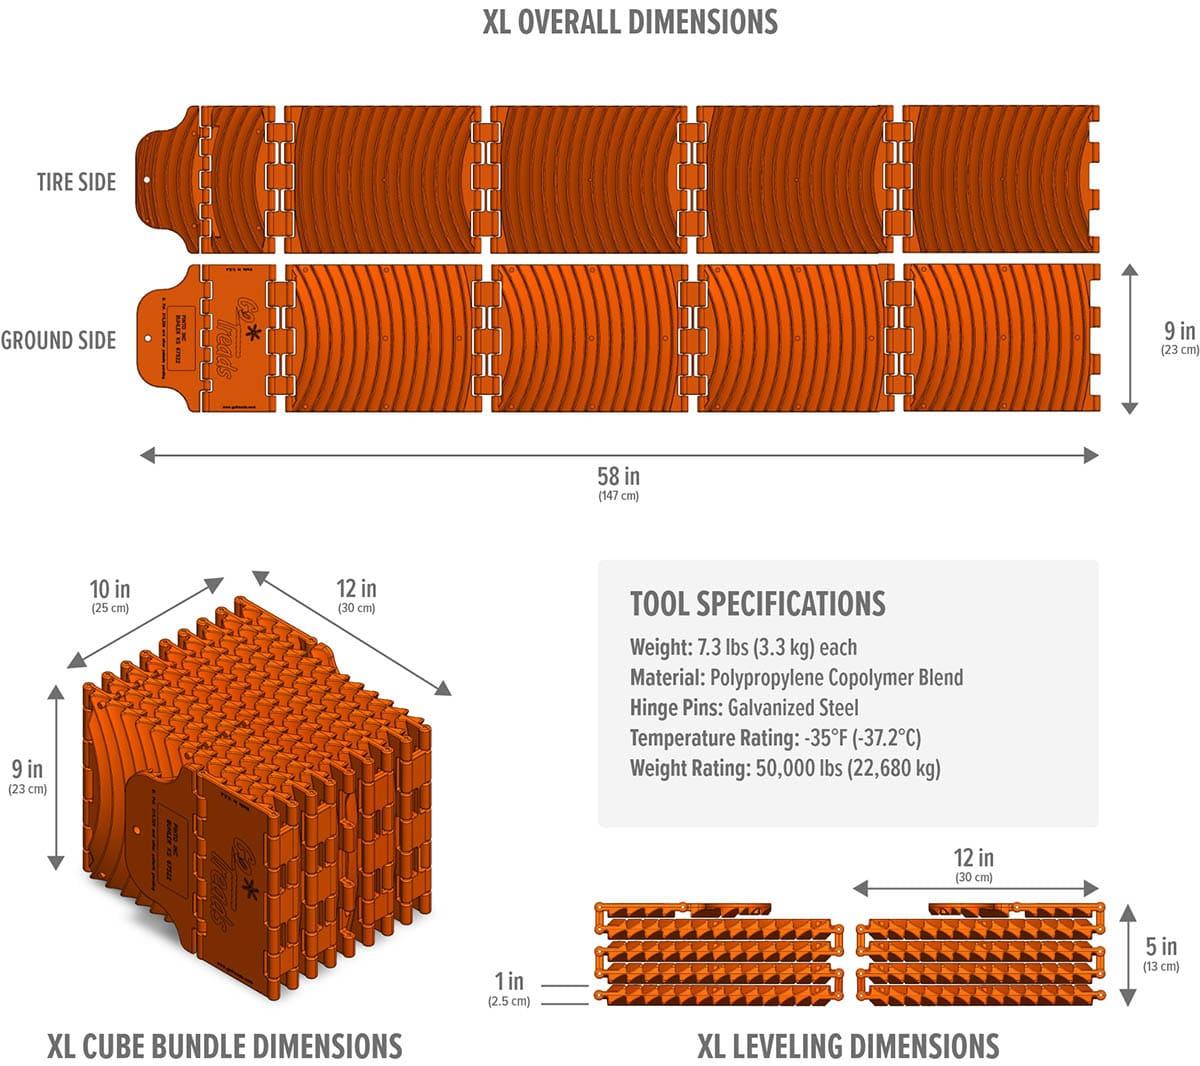 XL Dimensions